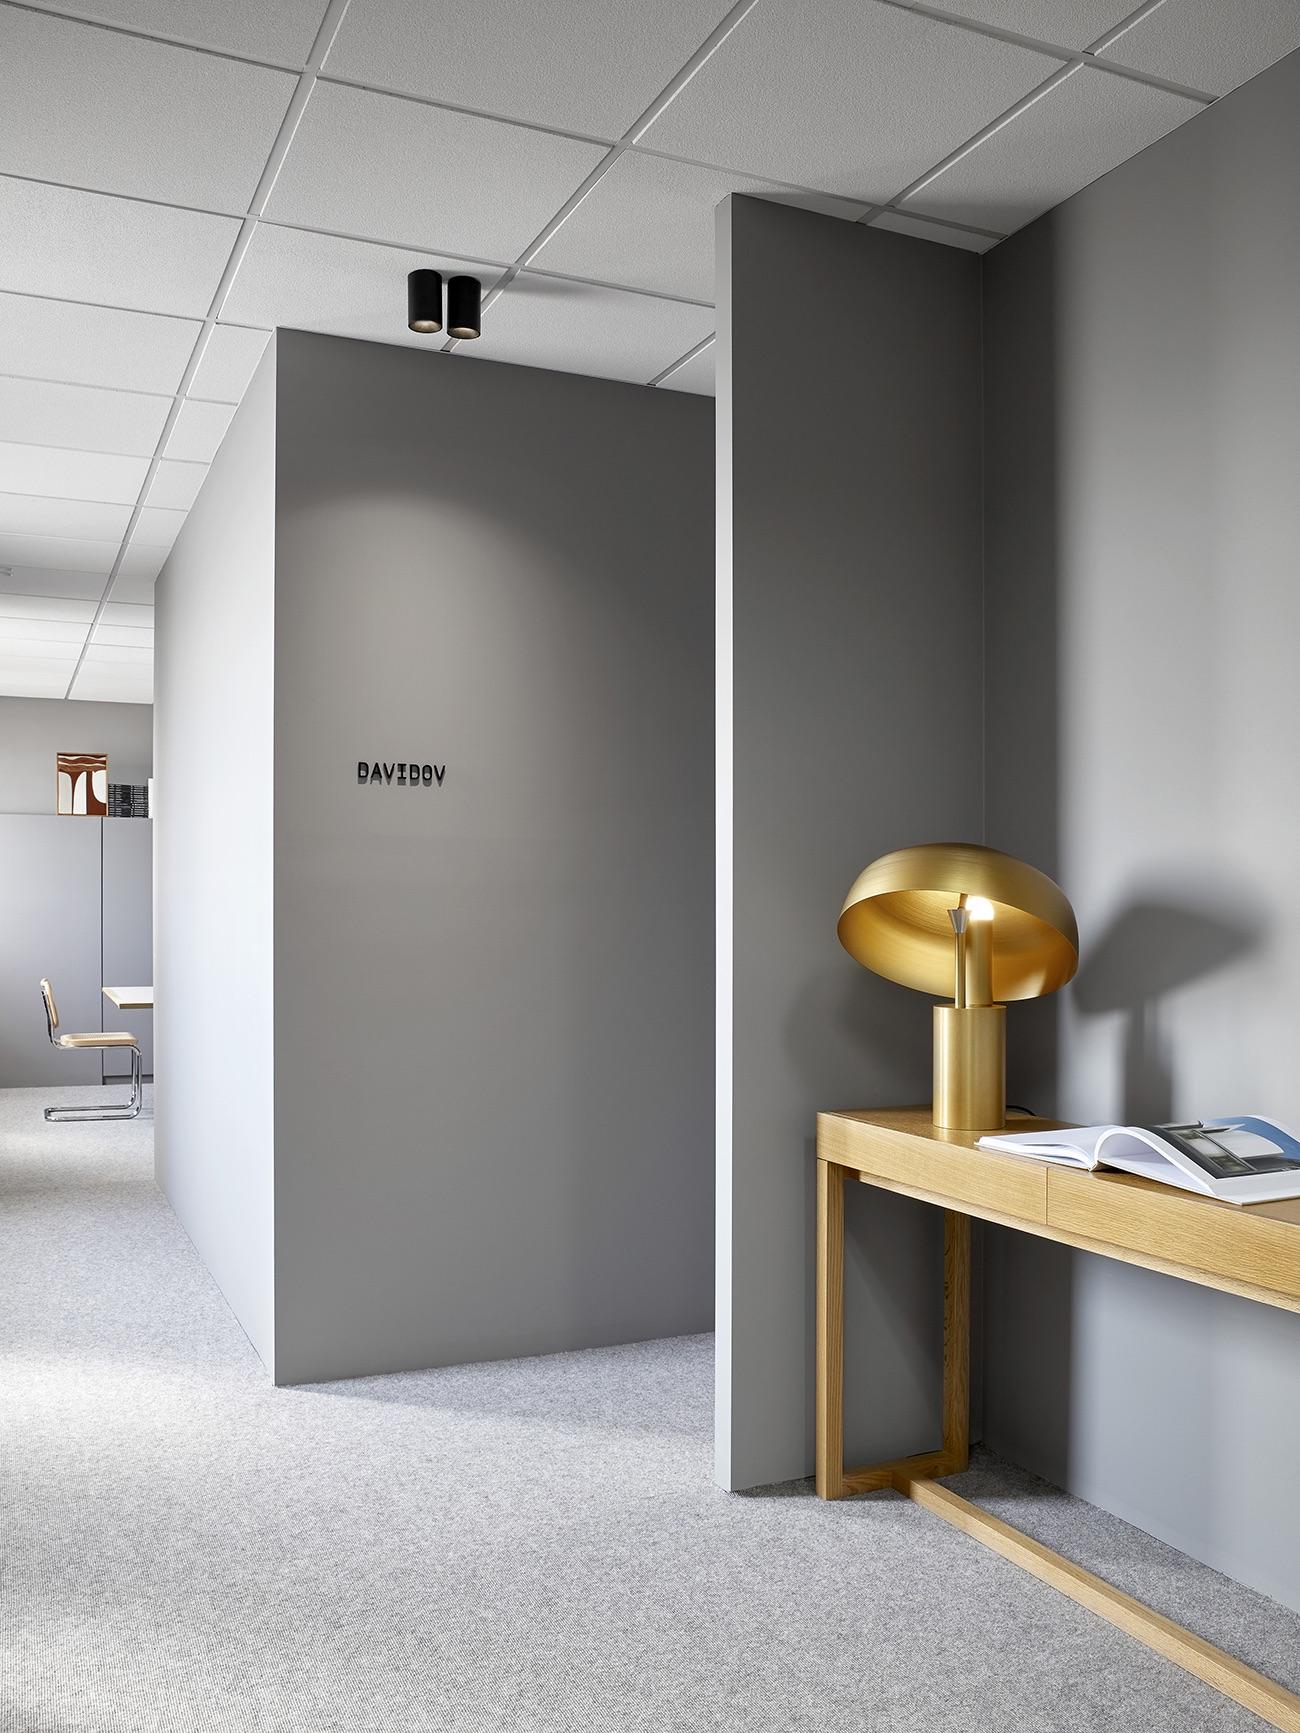 davidov-architects-studio-office-11